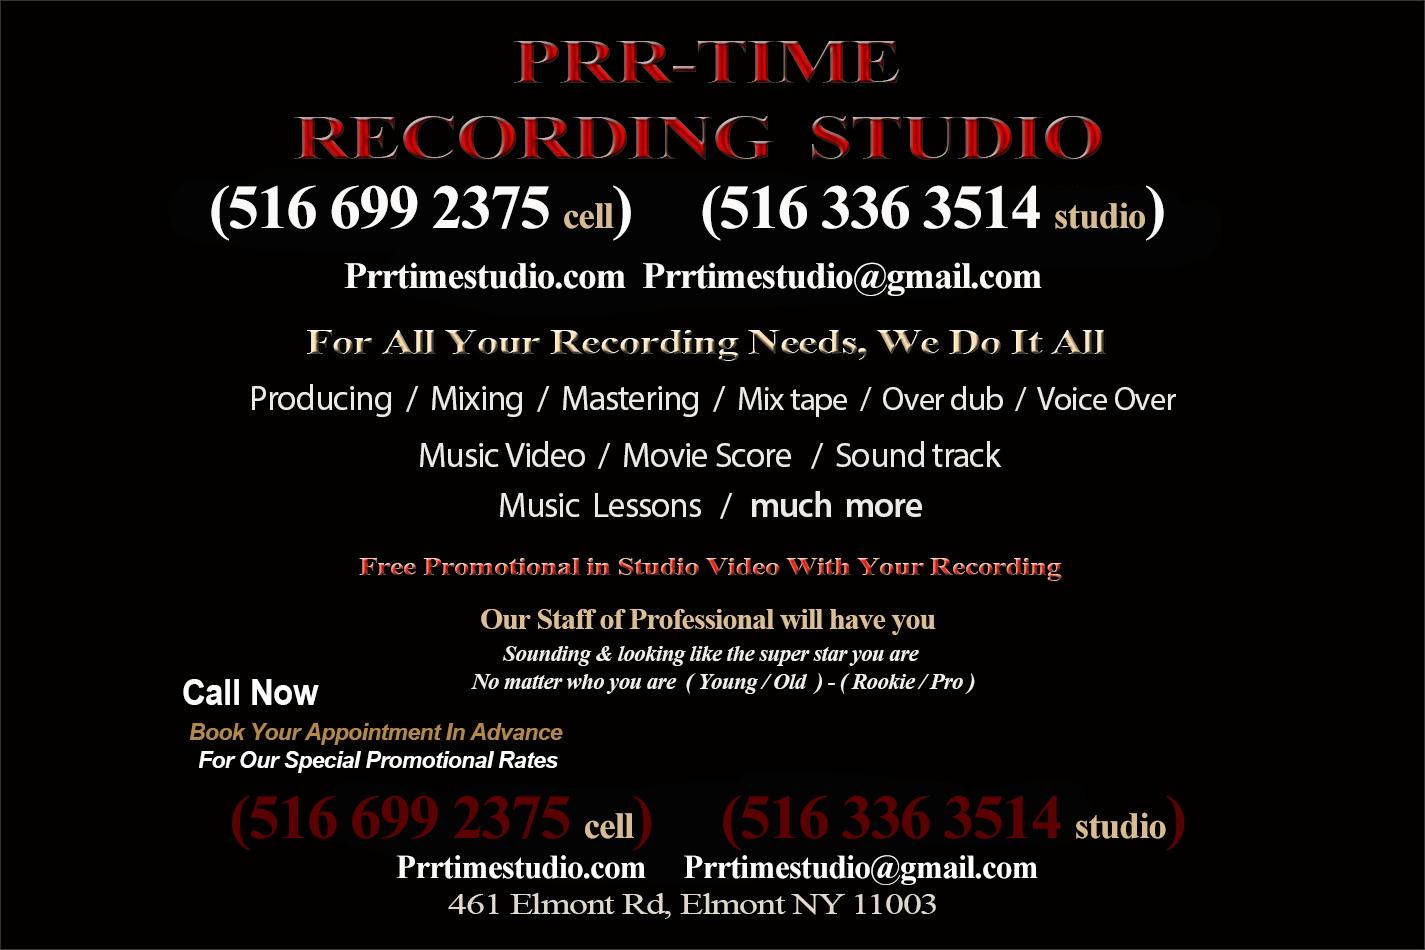 PRR-TIME_Rerocding Studio_BACK.png